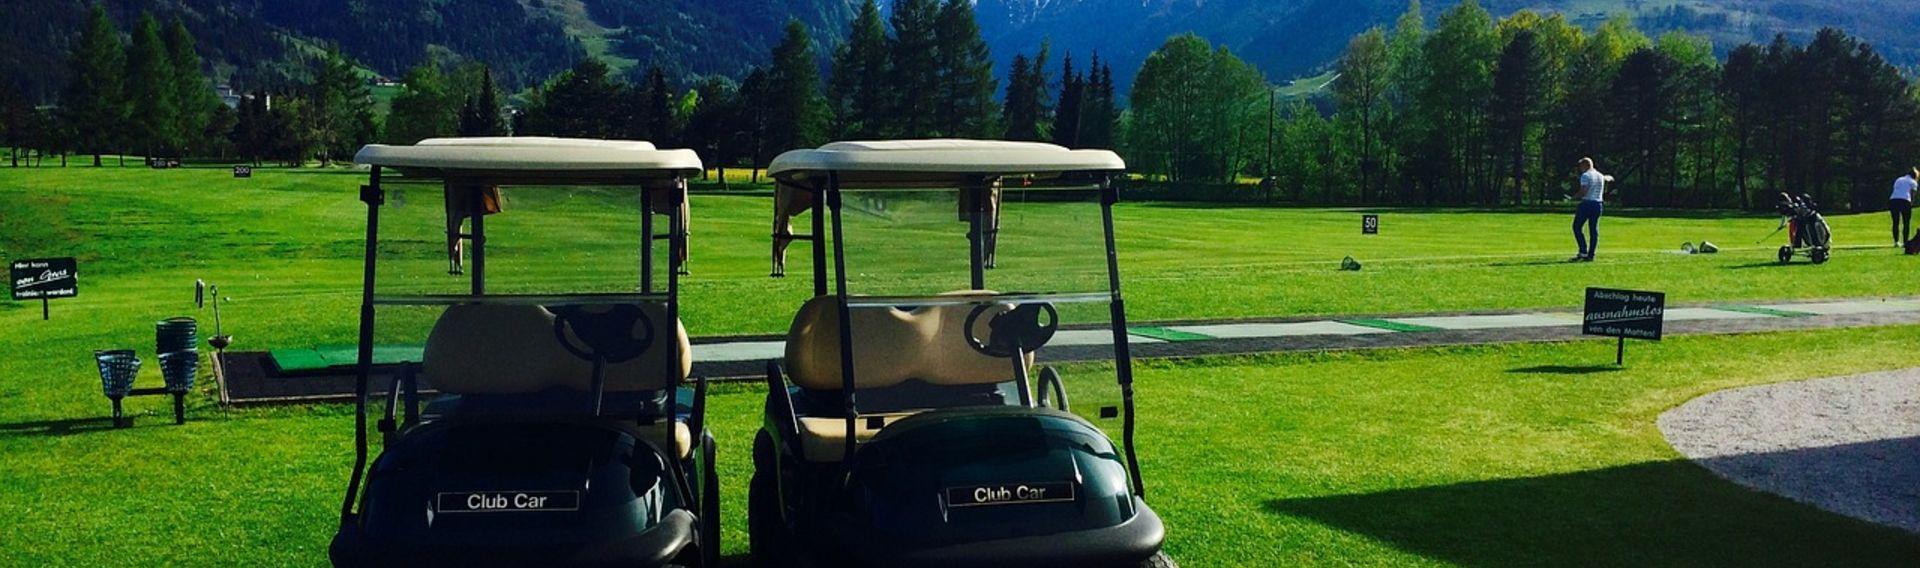 Golfhotels mit Hund